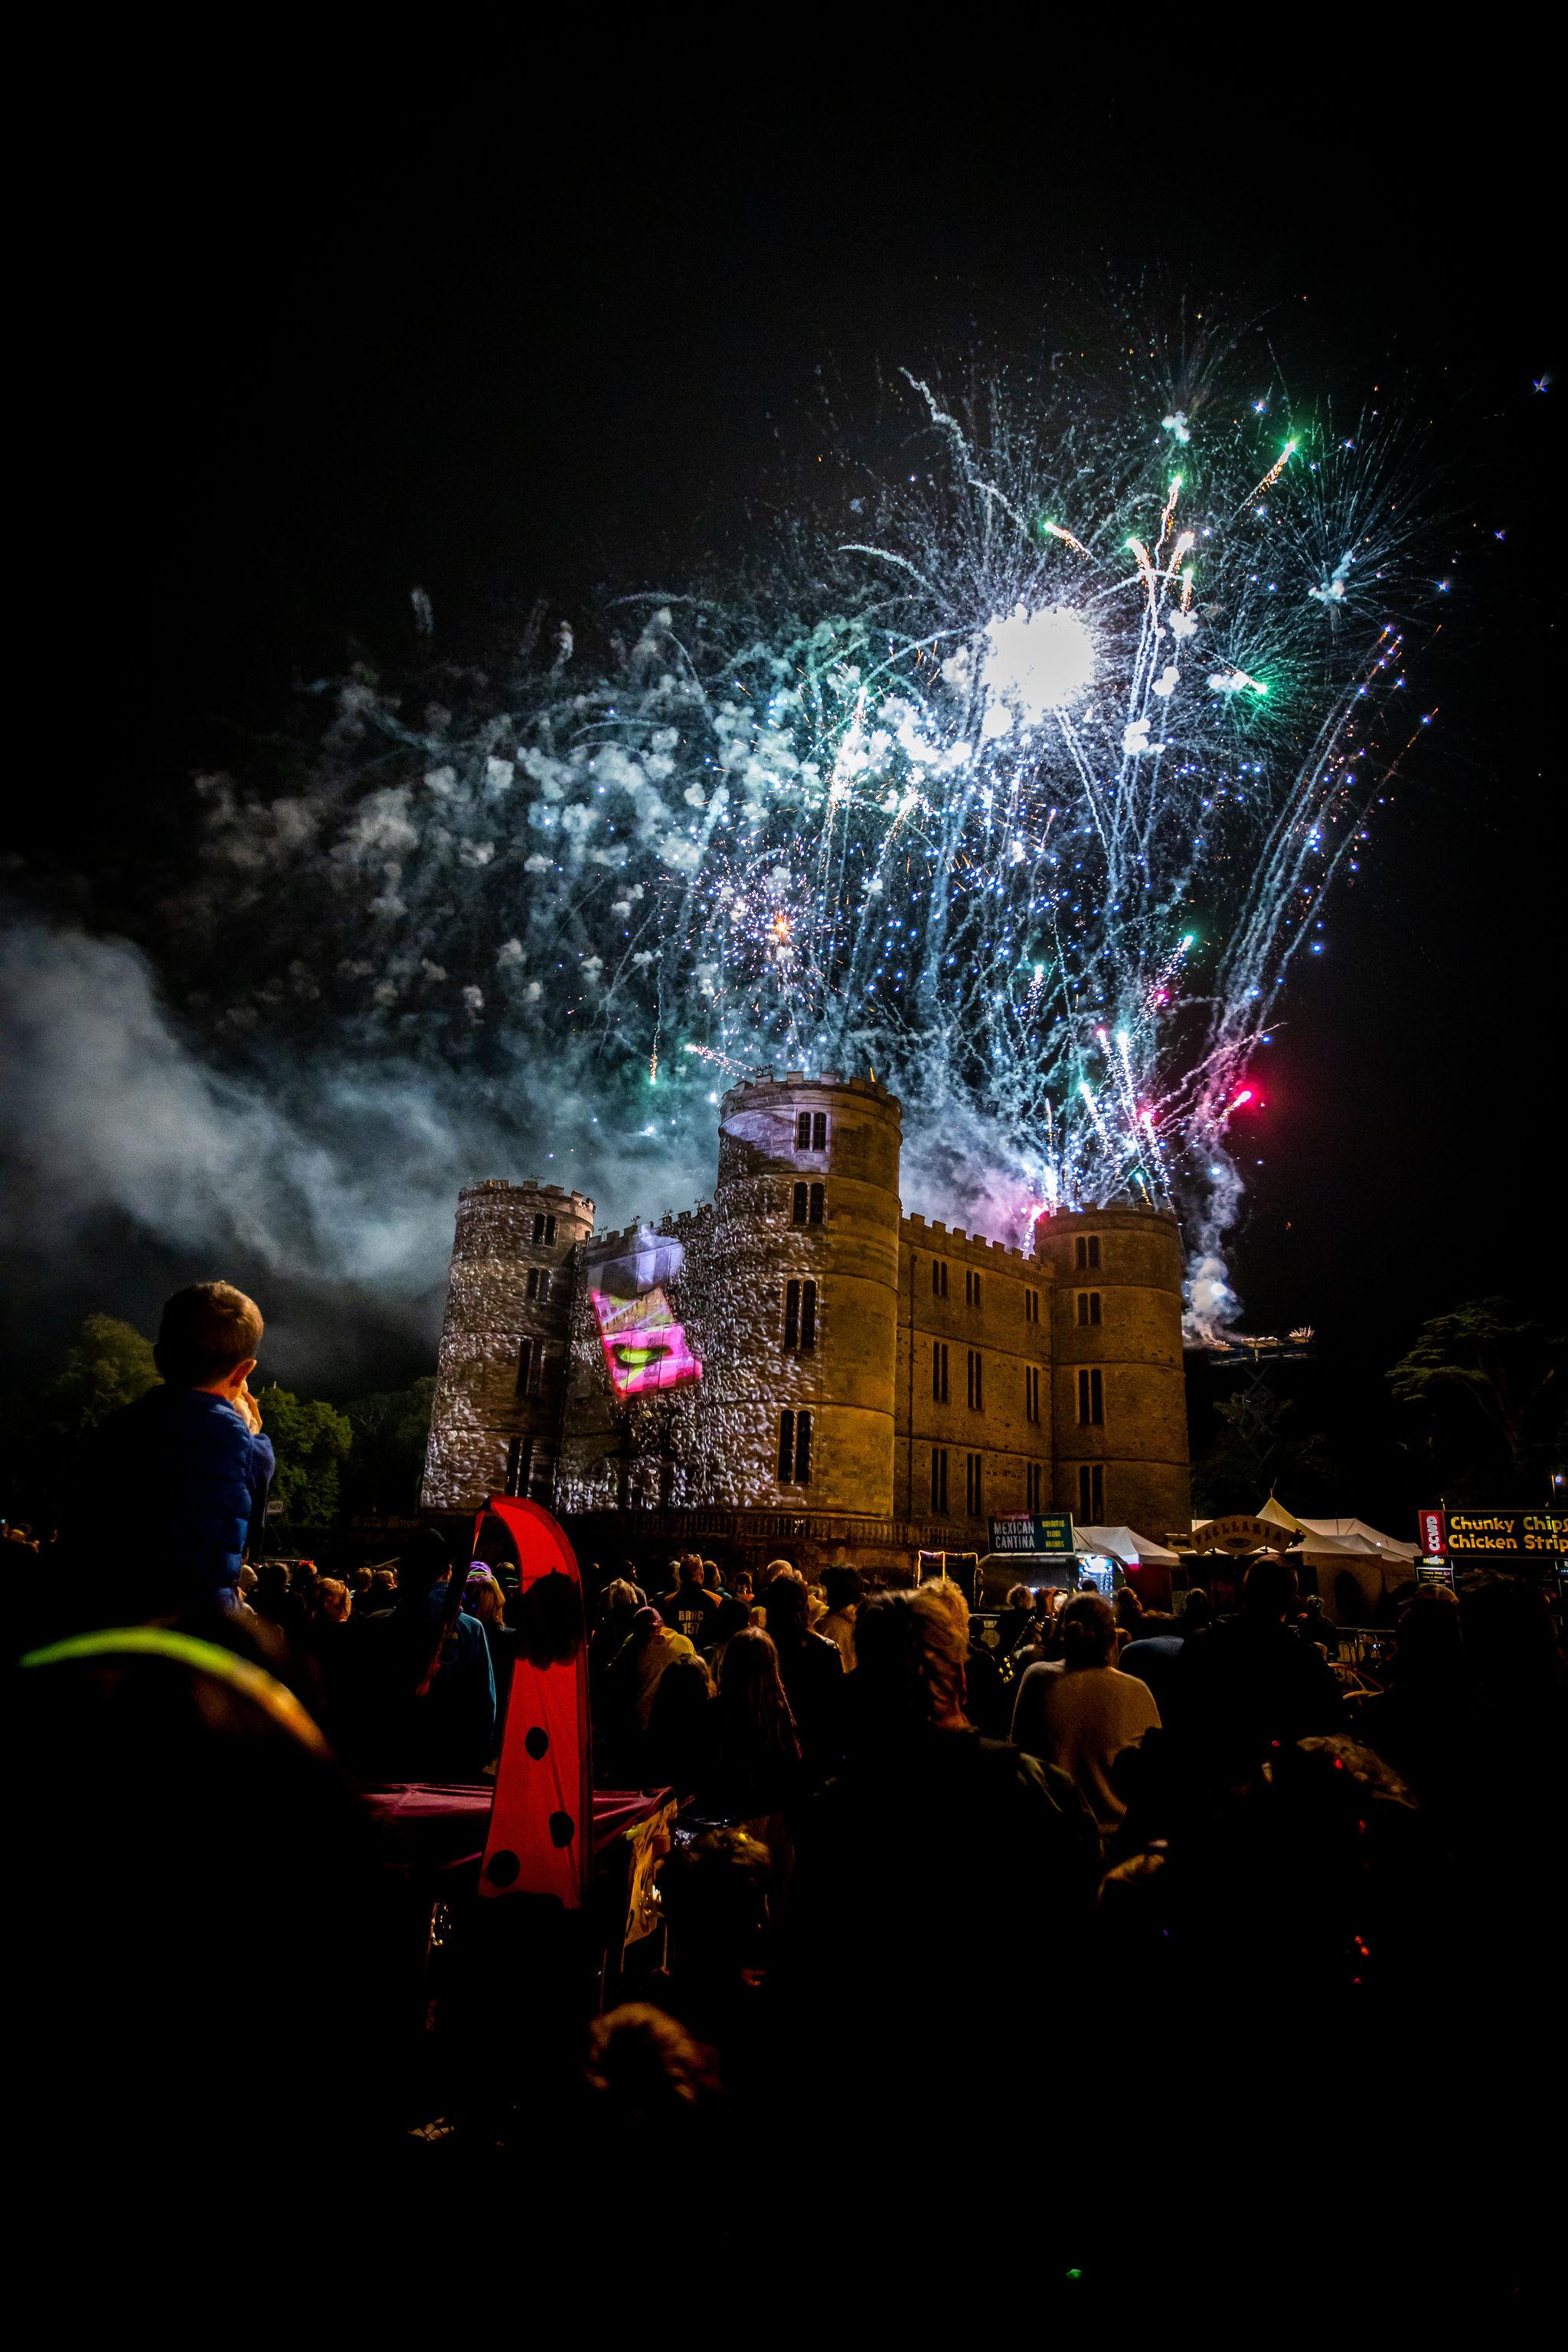 Sun_CastleStage_Fireworks_VF-4721.jpg